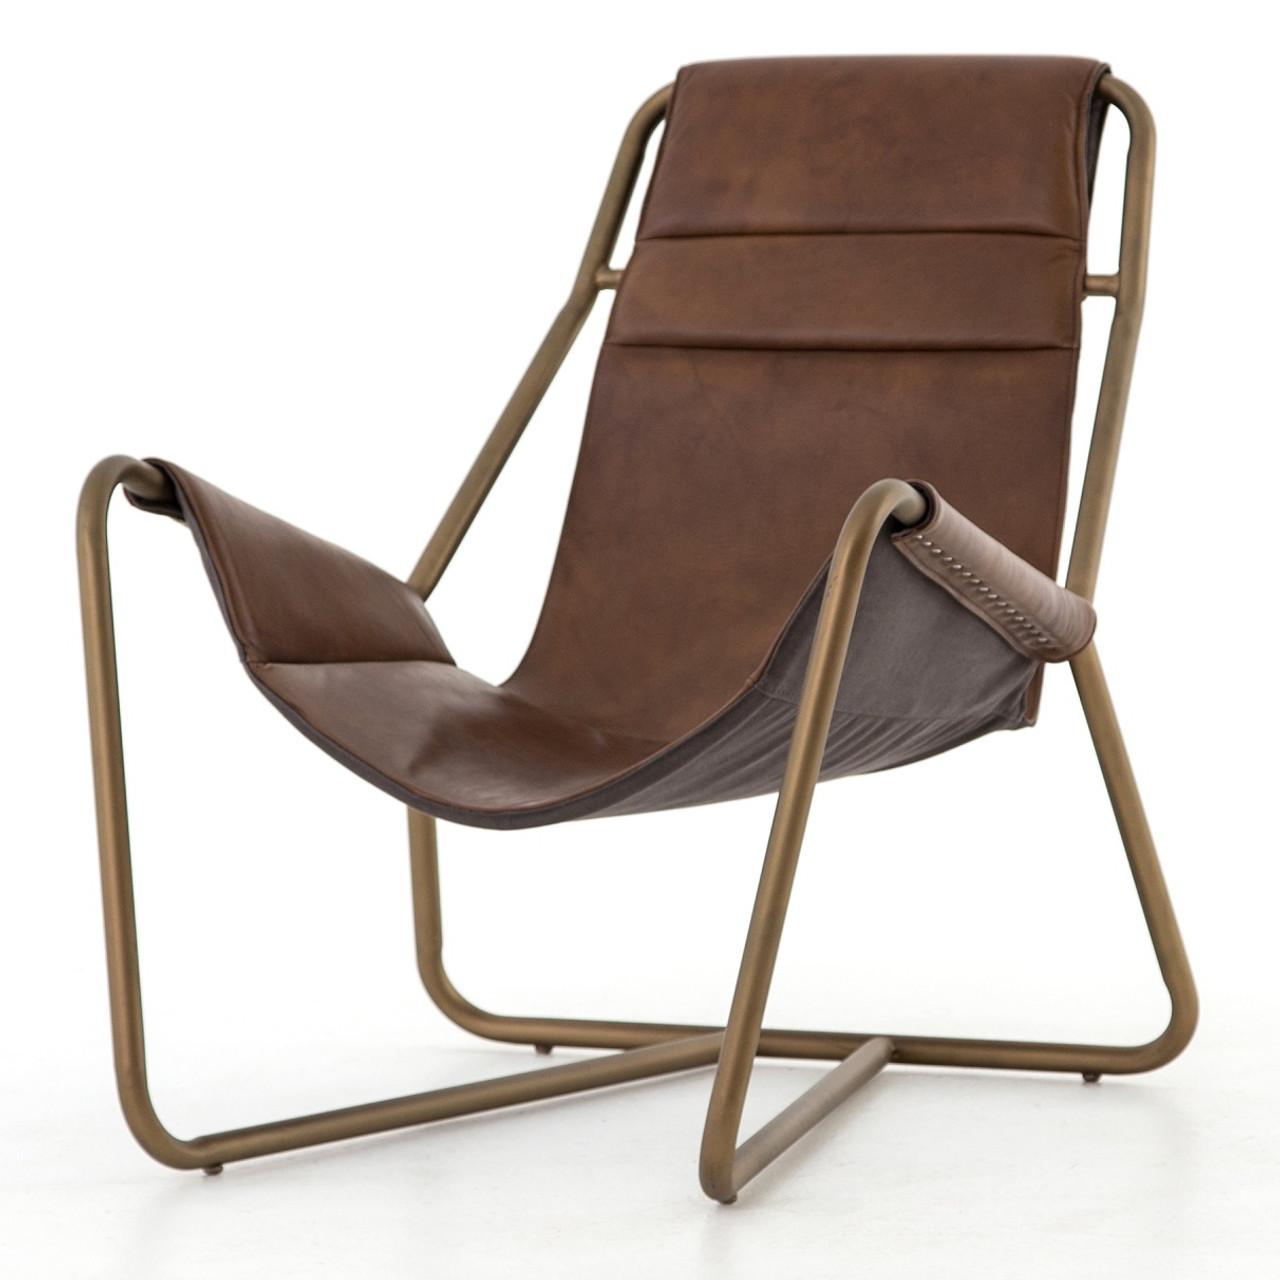 Vera Mid Century Brown Leather Lounge Chairs Brass Zin